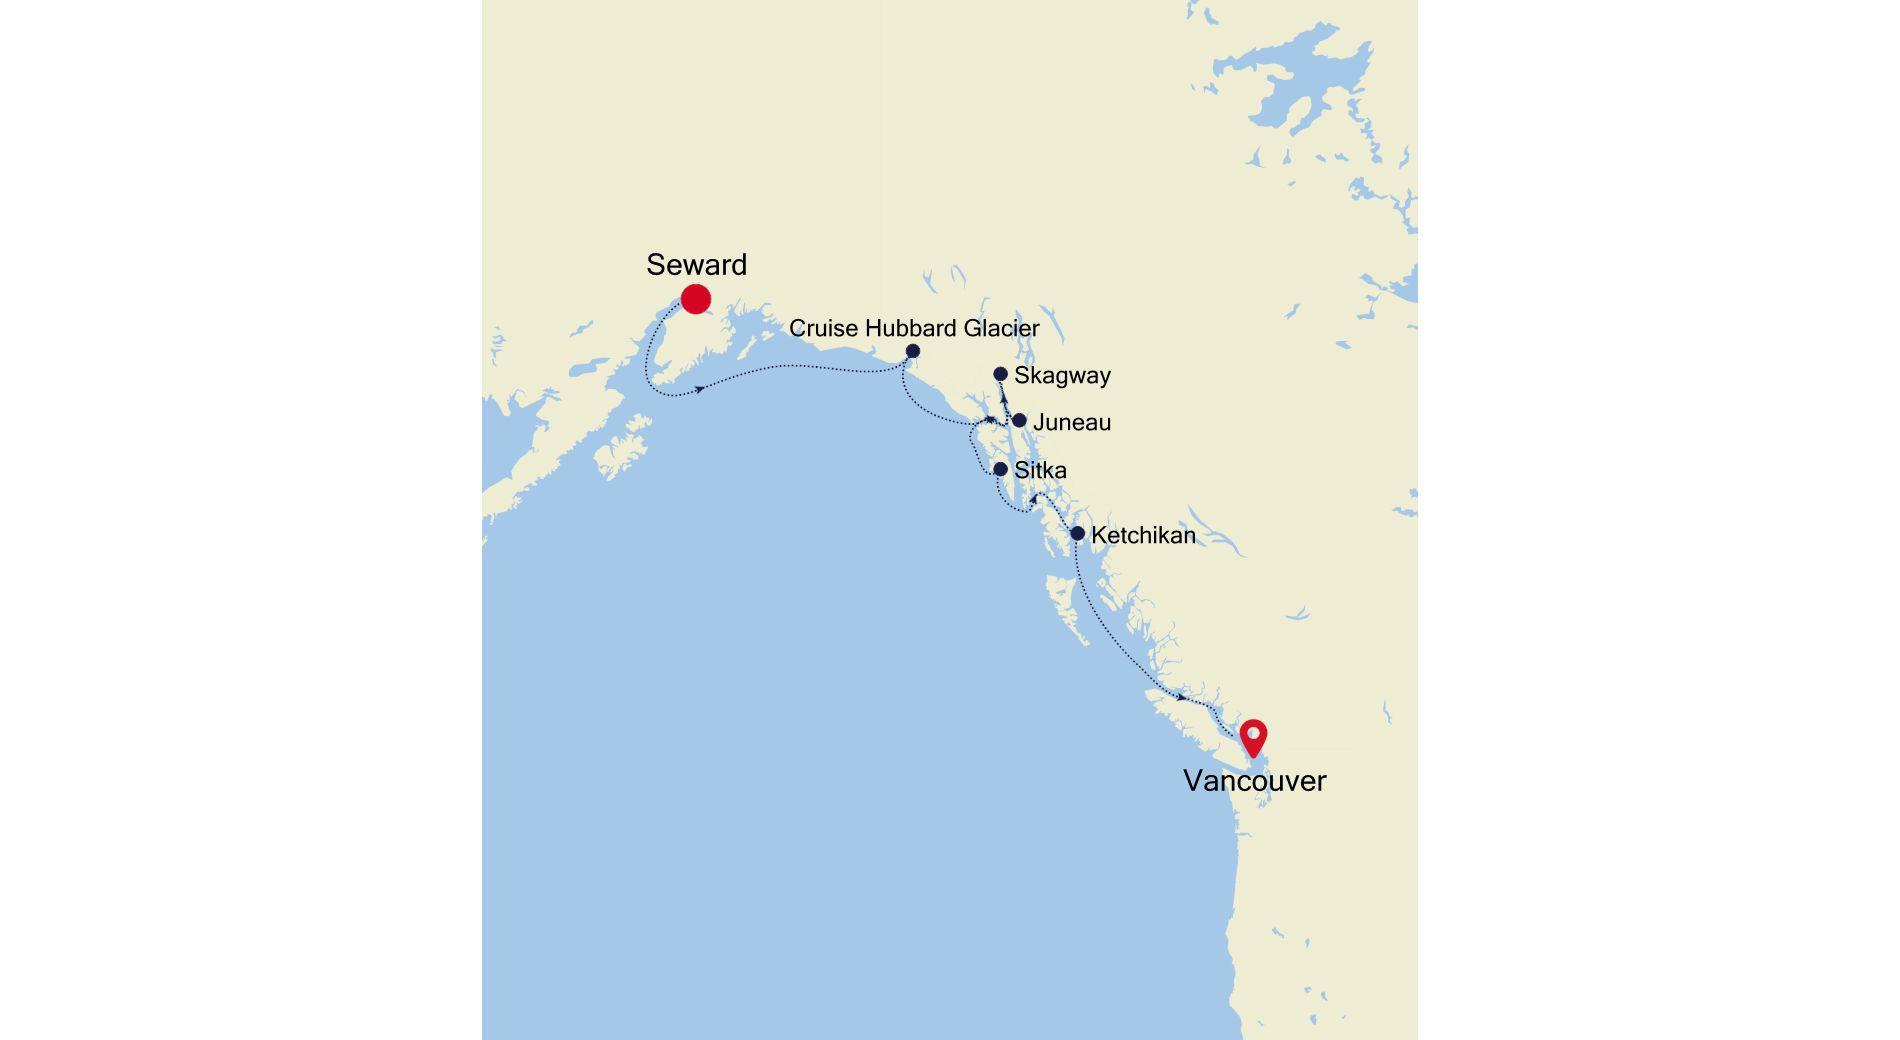 6917 - Seward to Vancouver